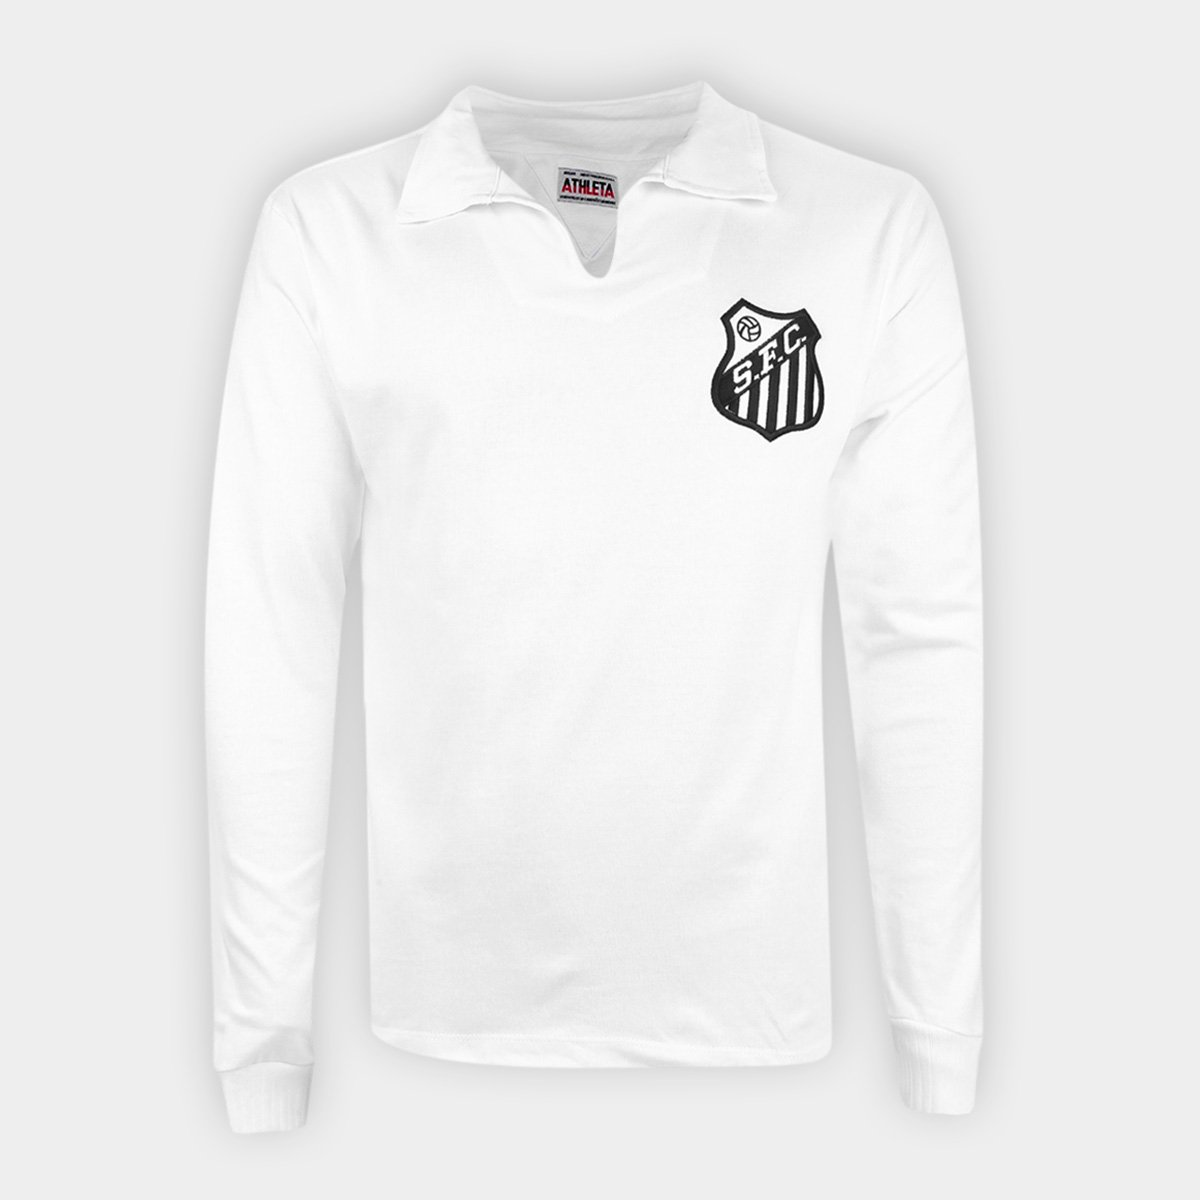 Camisa Polo Retrô Santos Manga Longa 62/63 nº 10 Athleta Masculina